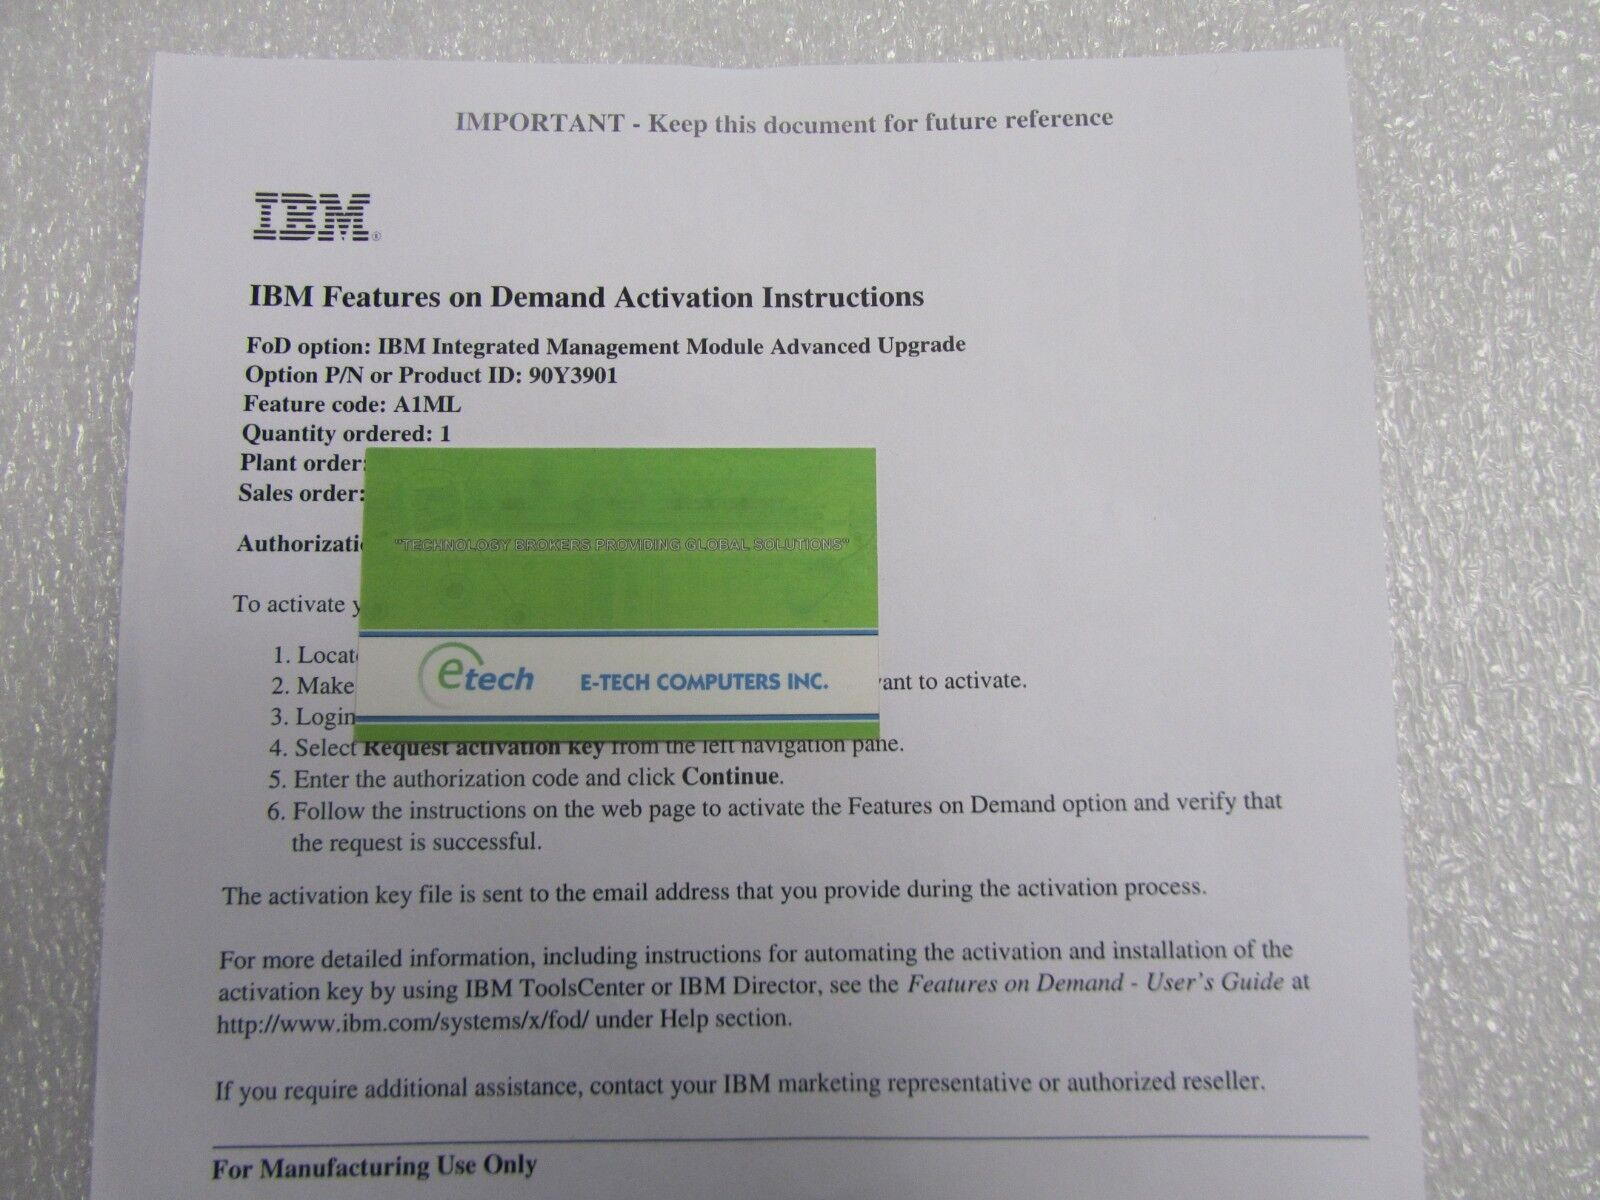 ibm imm activation key